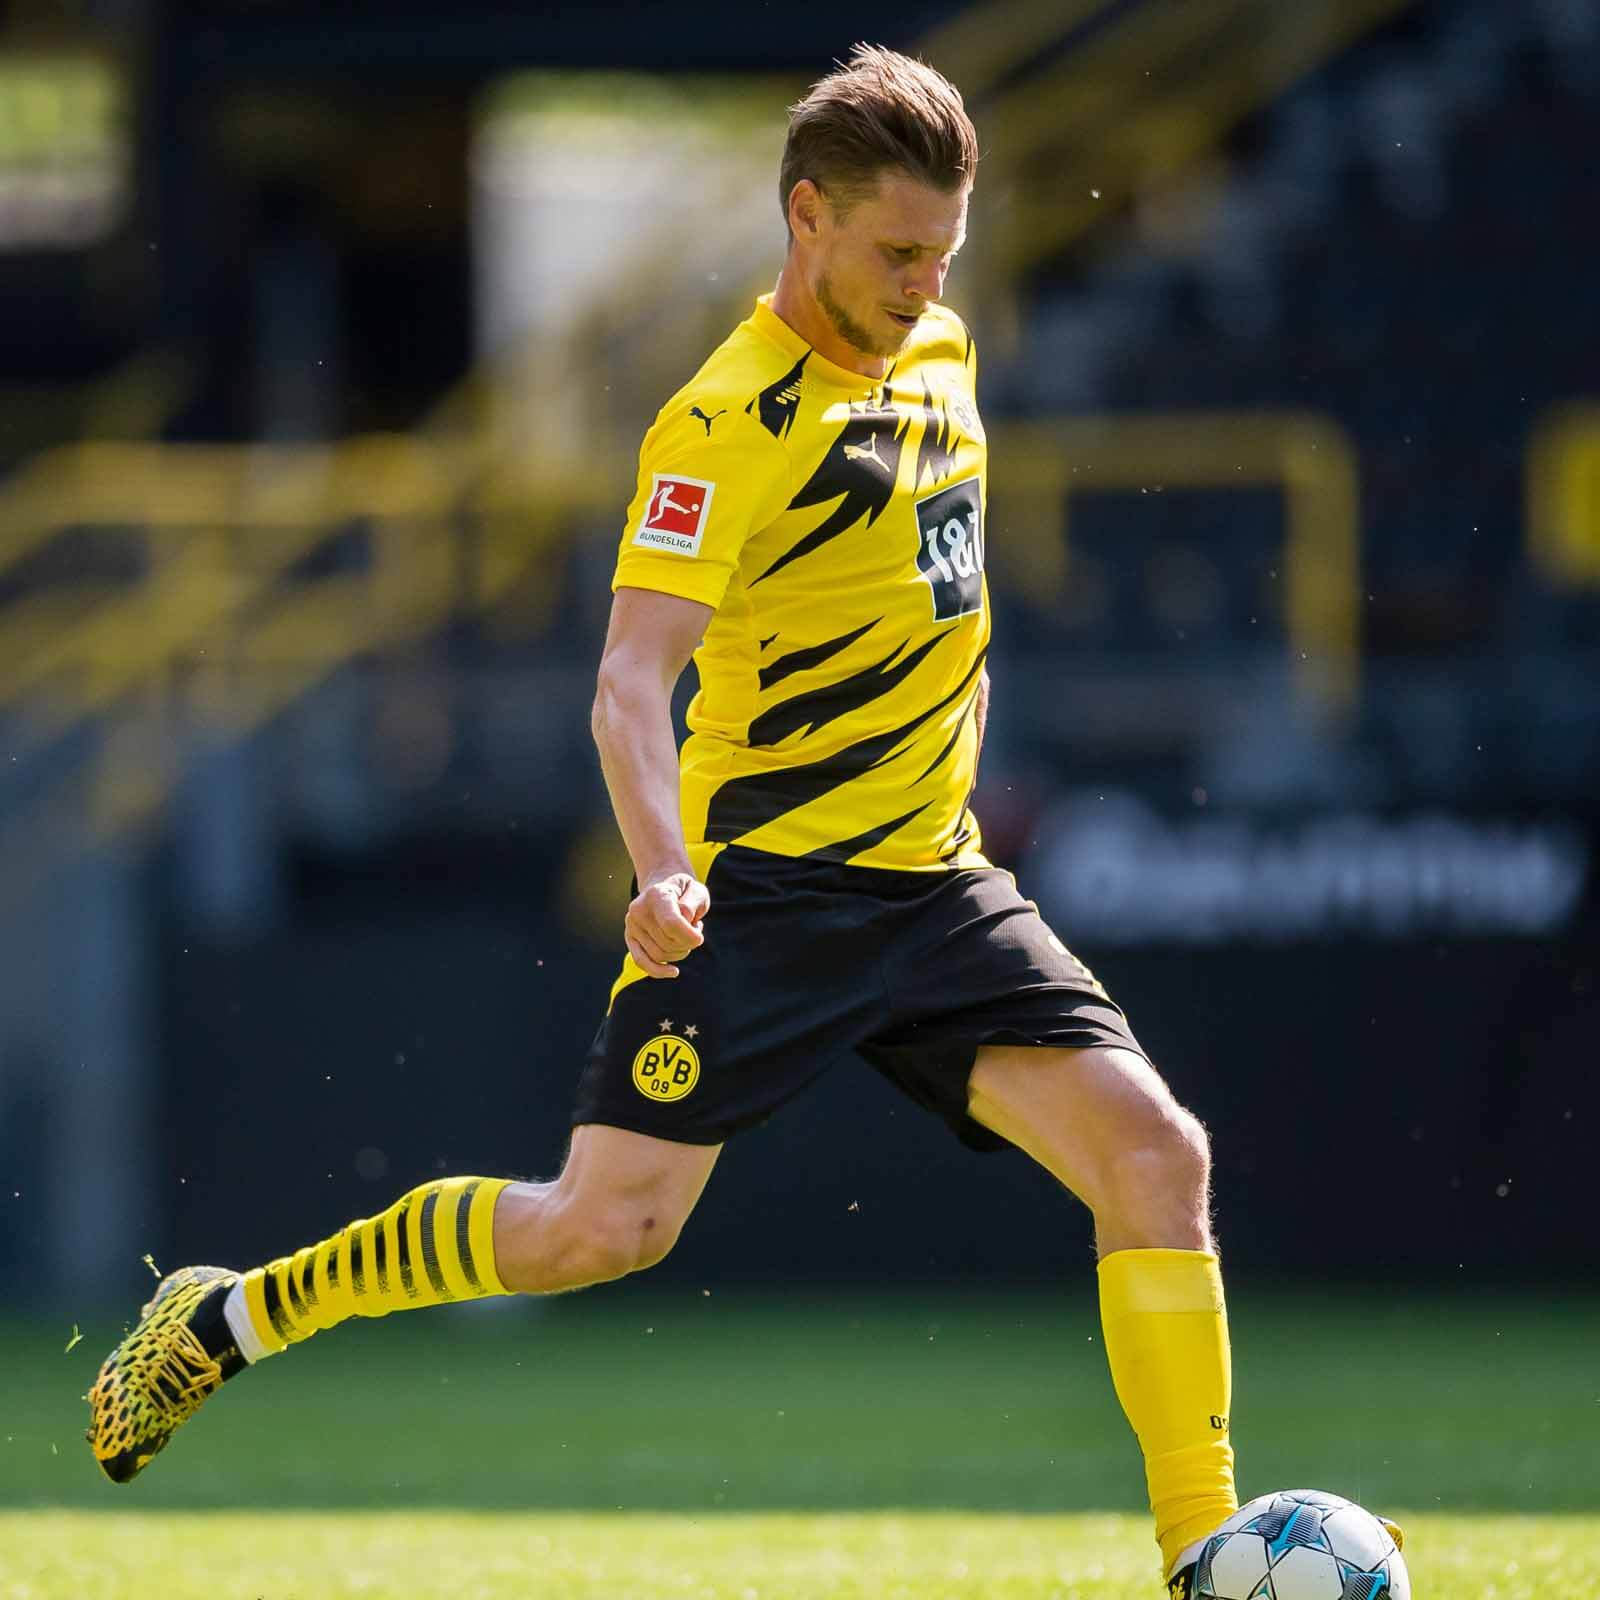 Borussia Dortmund 2020 21 Puma Home Kit 20 21 Kits Football Shirt Blog